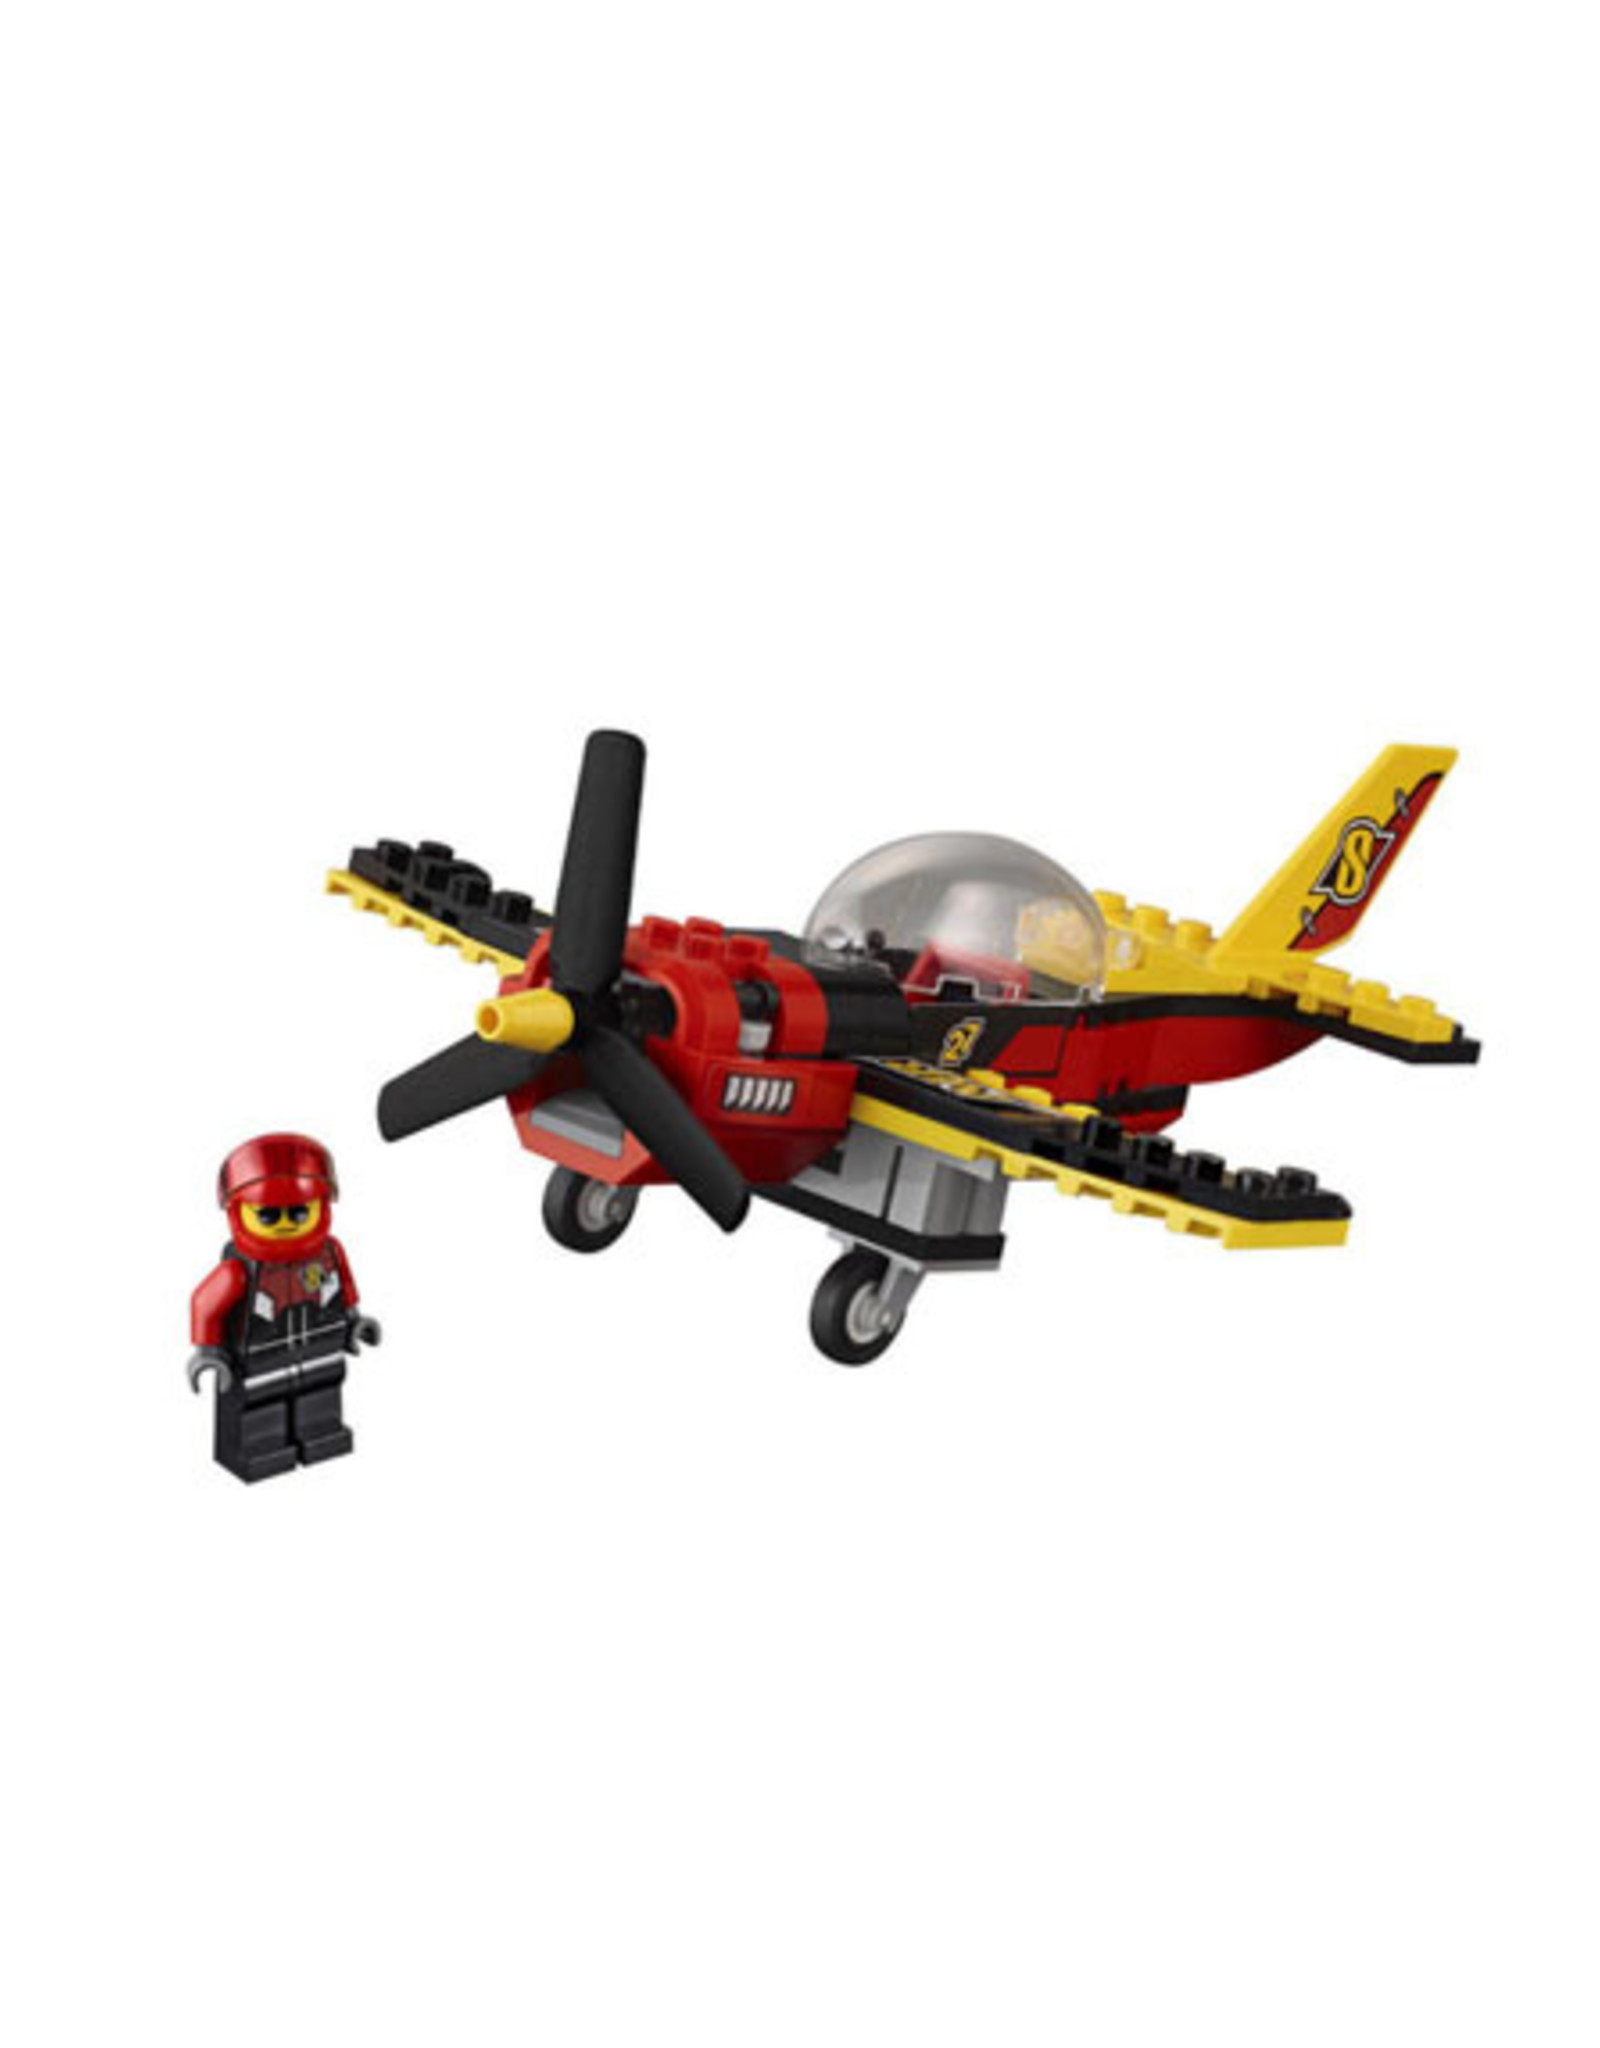 LEGO LEGO 60144 Race Plane CITY